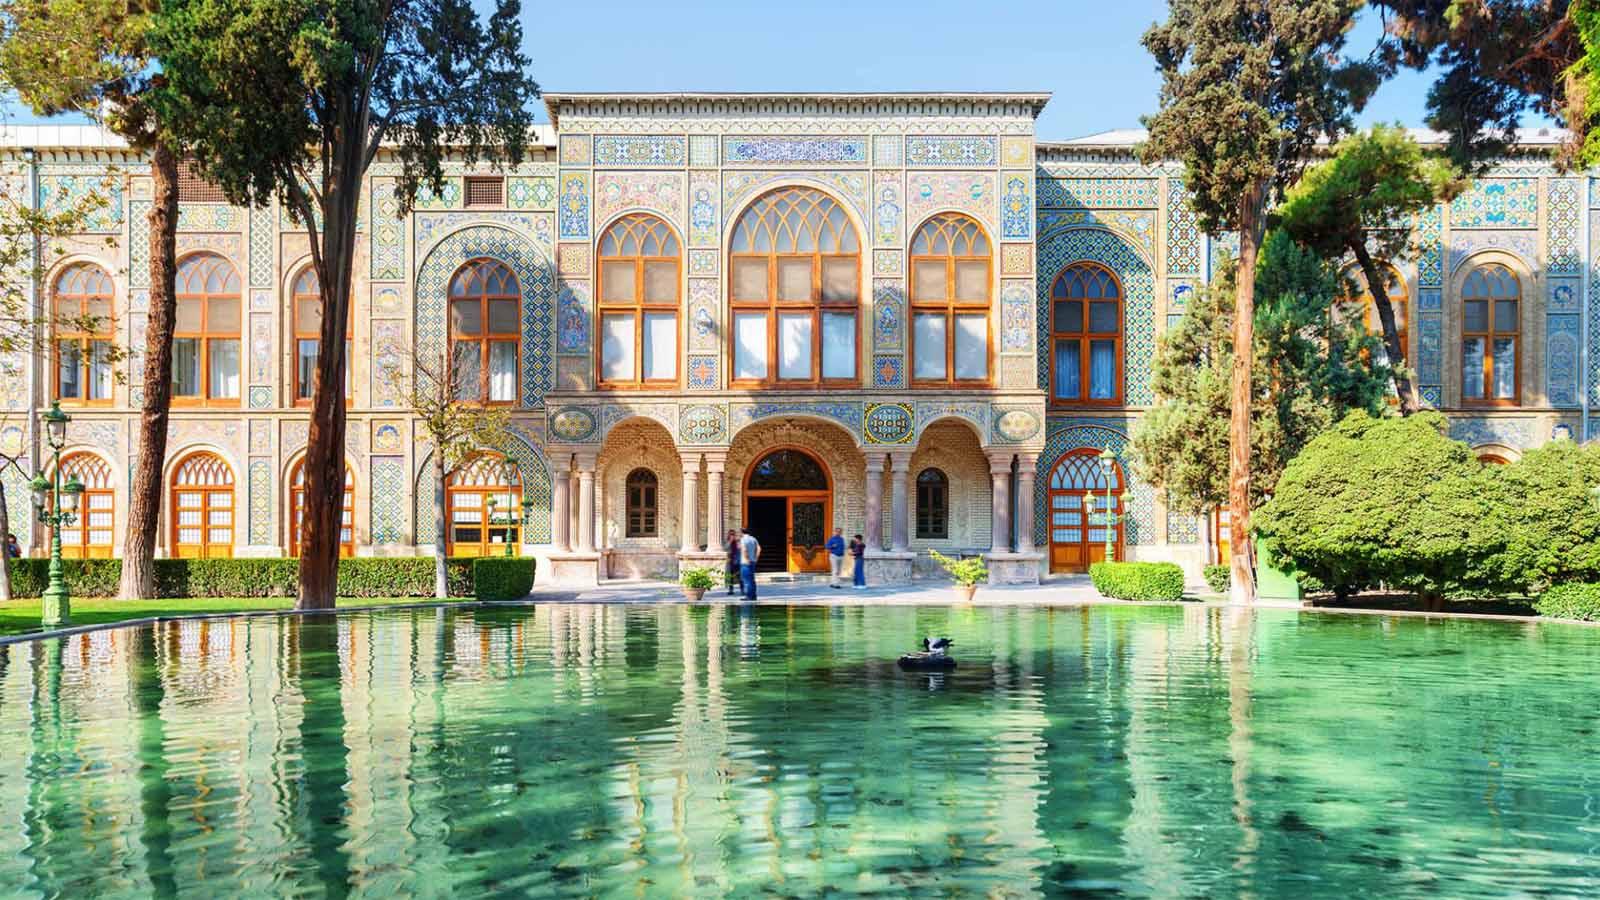 Golestan palace in tehran-UNESCO world heritage site